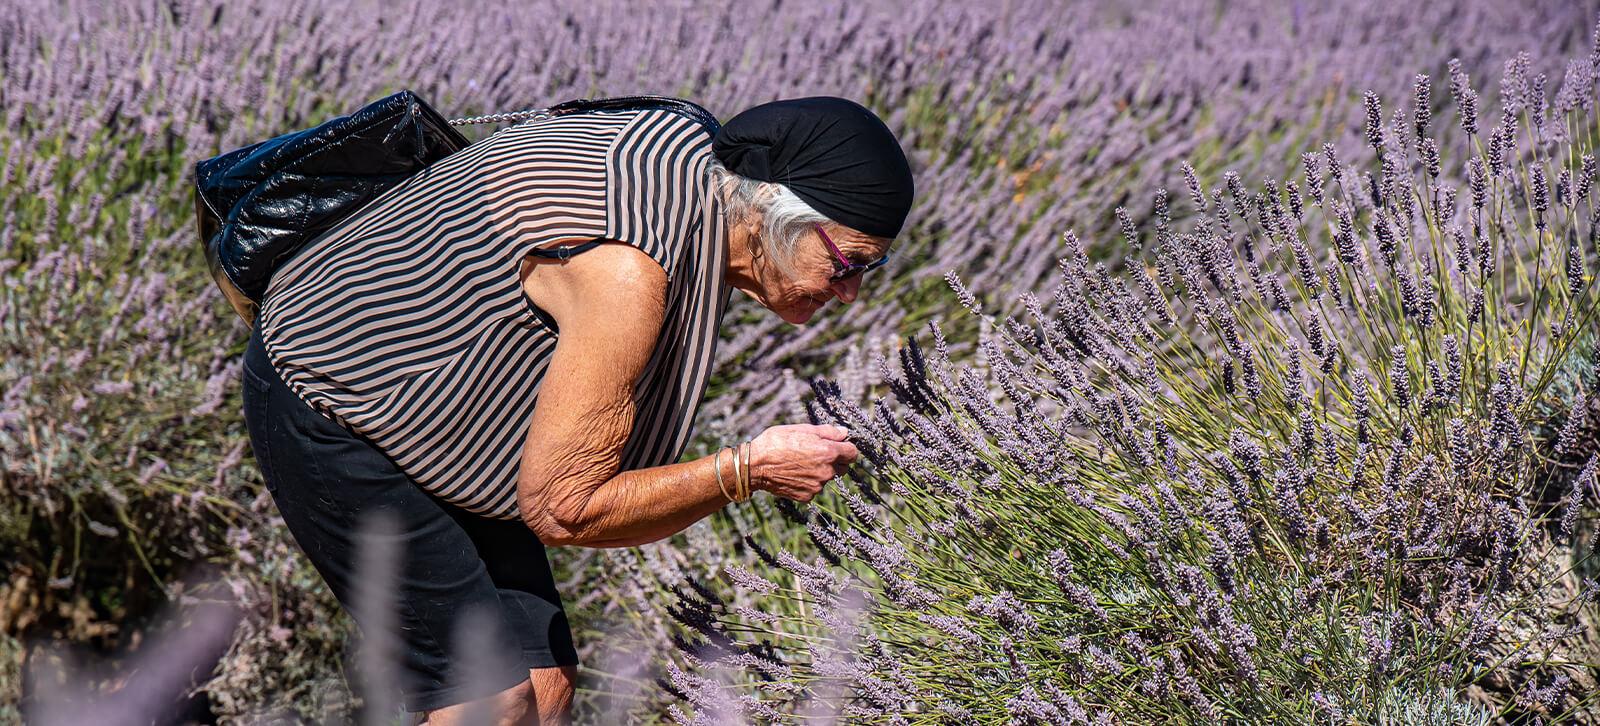 Lady Smelling Lavender